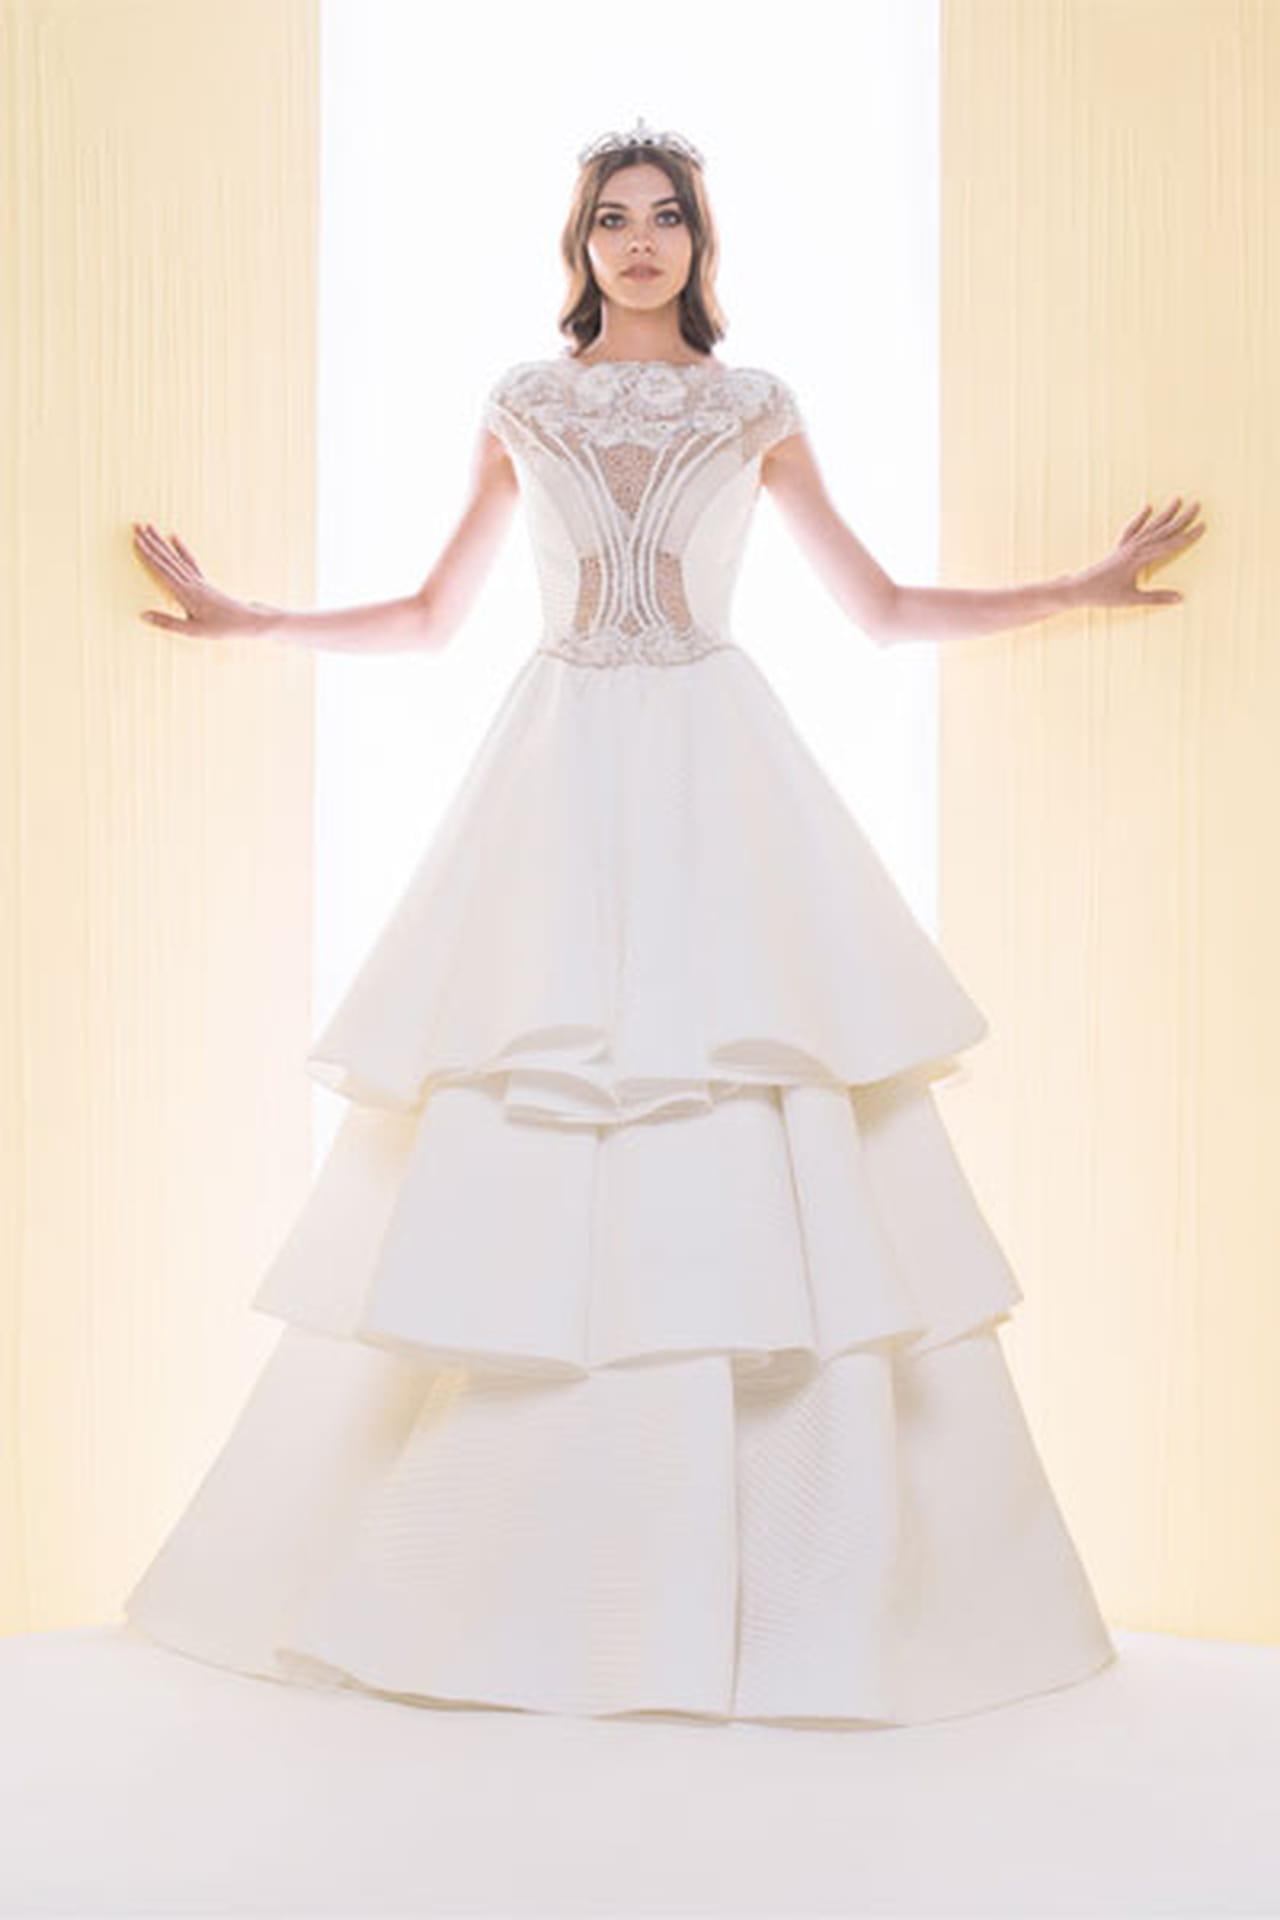 bb6ad995d أجمل فساتين زفاف سعيد قبيسي 2016